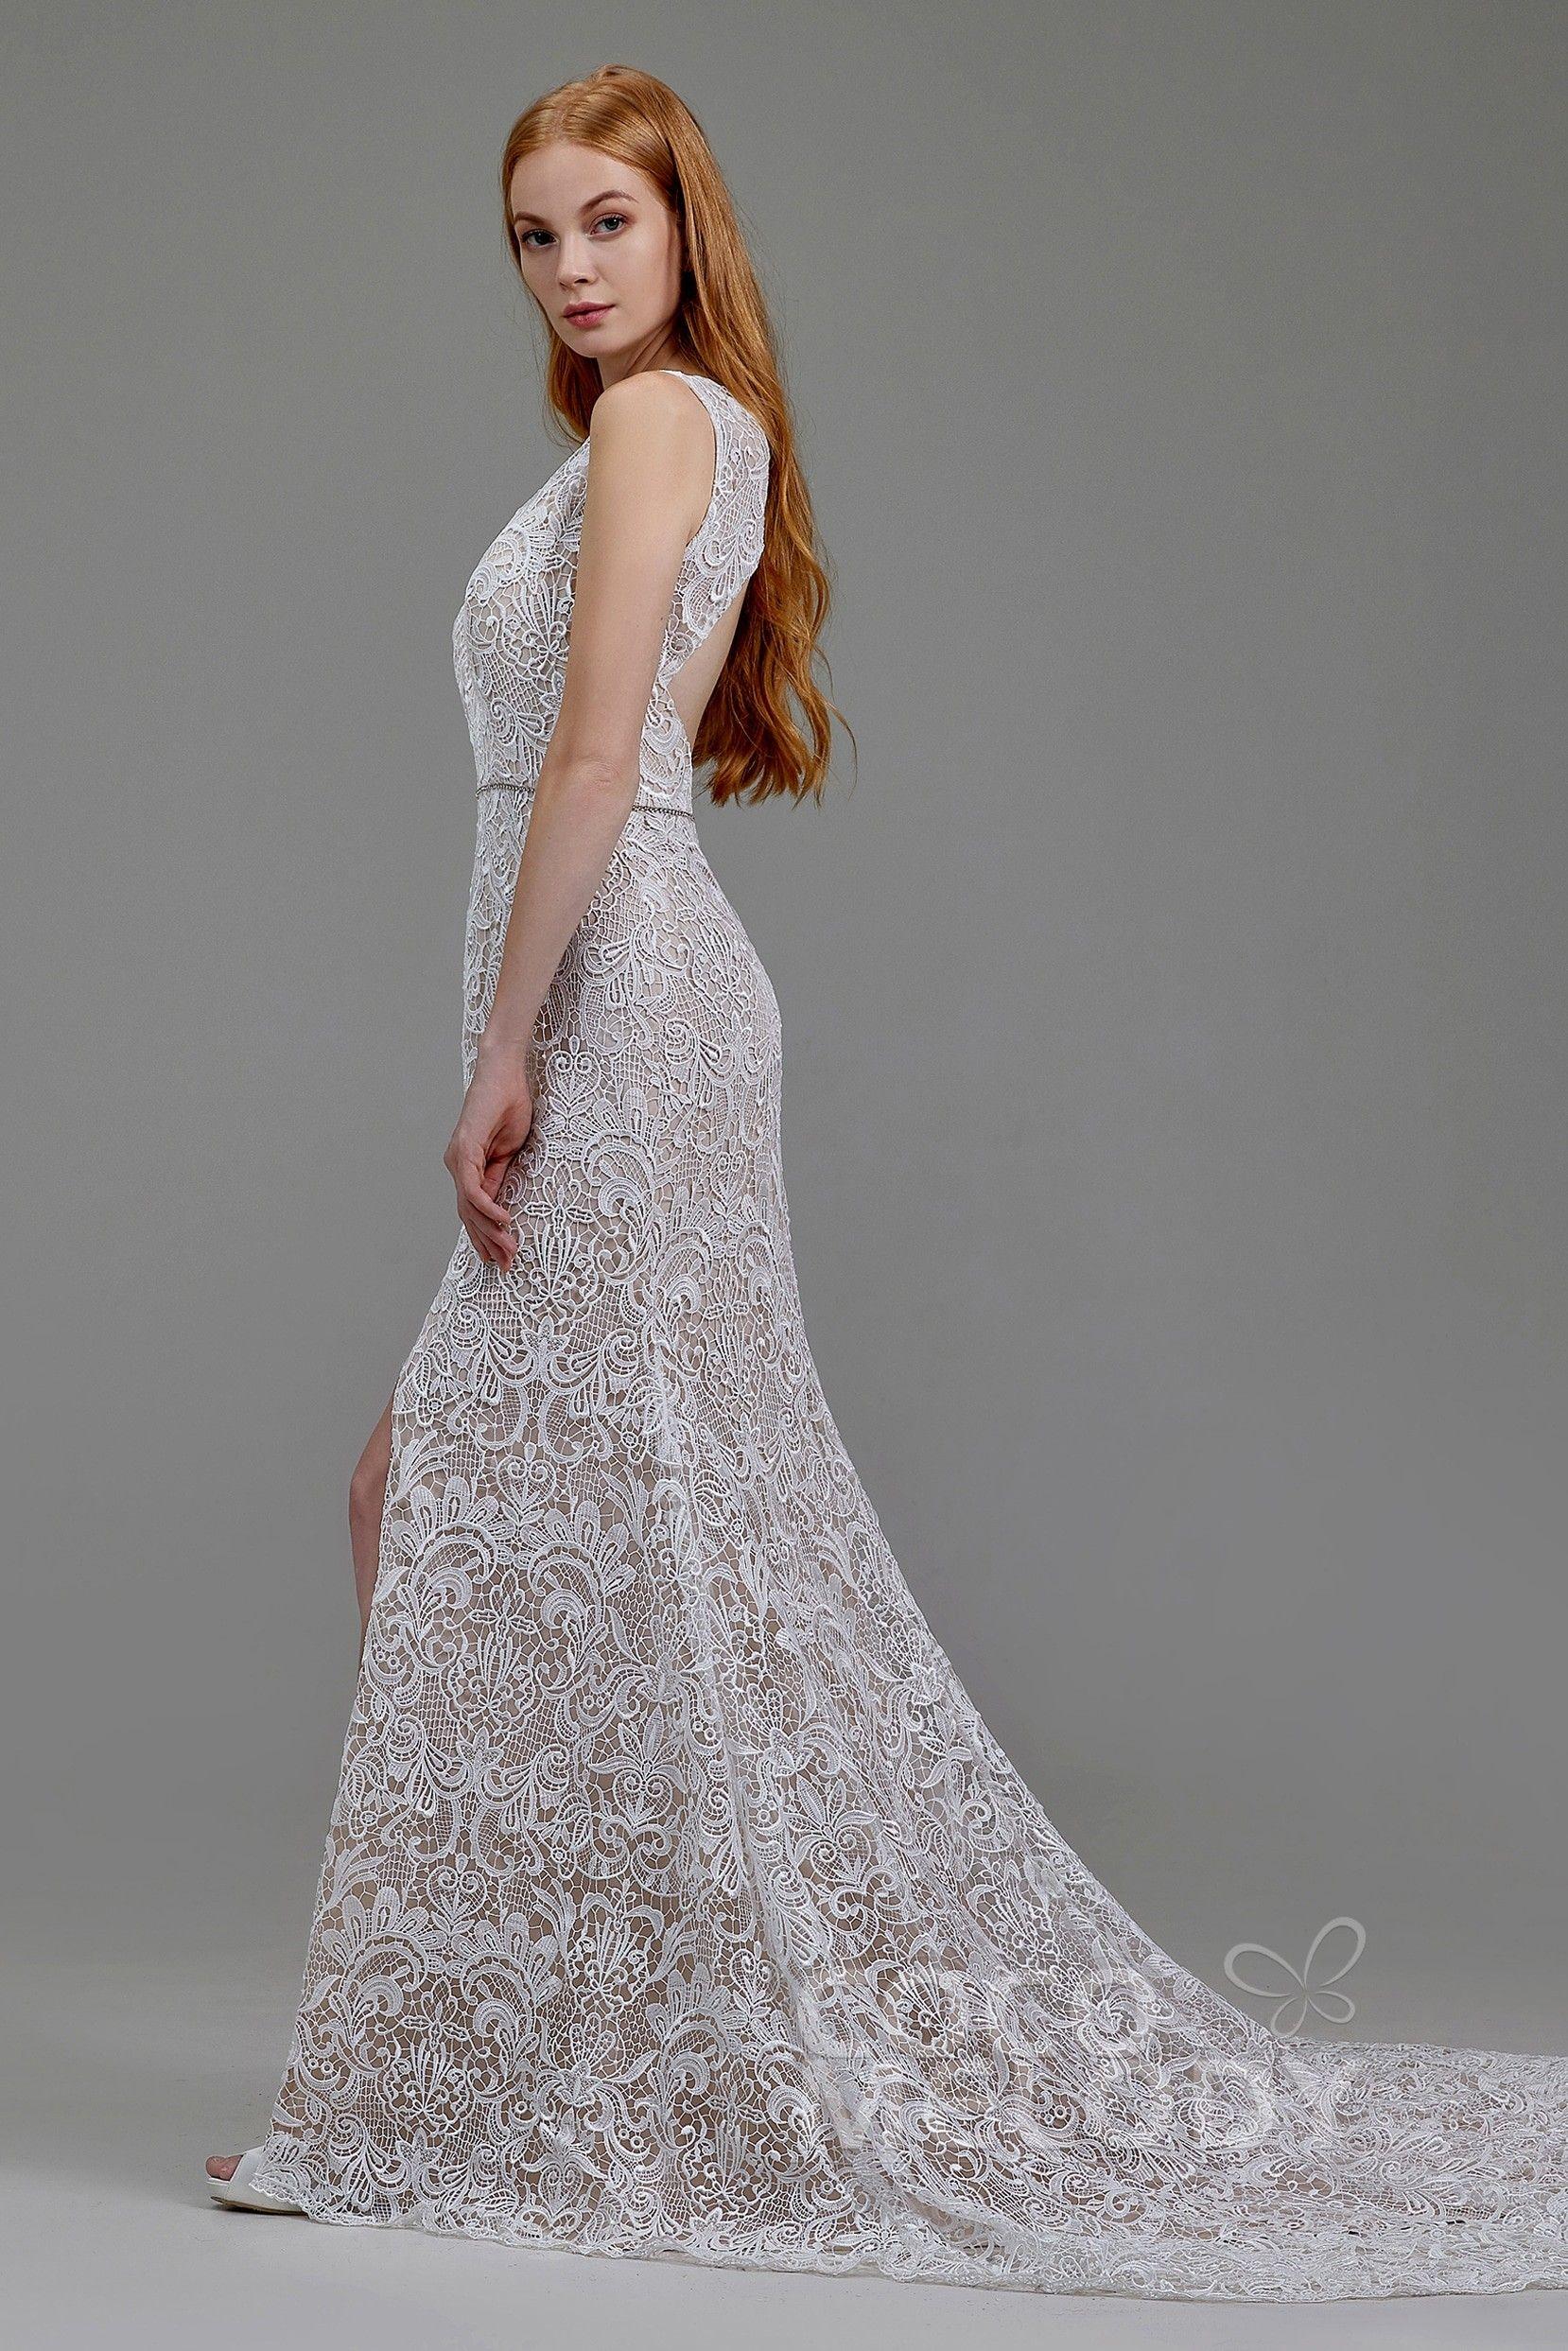 Classic Natural Court Train Lace Wedding Dress Ld5782 Cocomelody Cocomelody Weddingdress Br Wedding Dresses Lace Ball Gowns Wedding Classic Wedding Dress